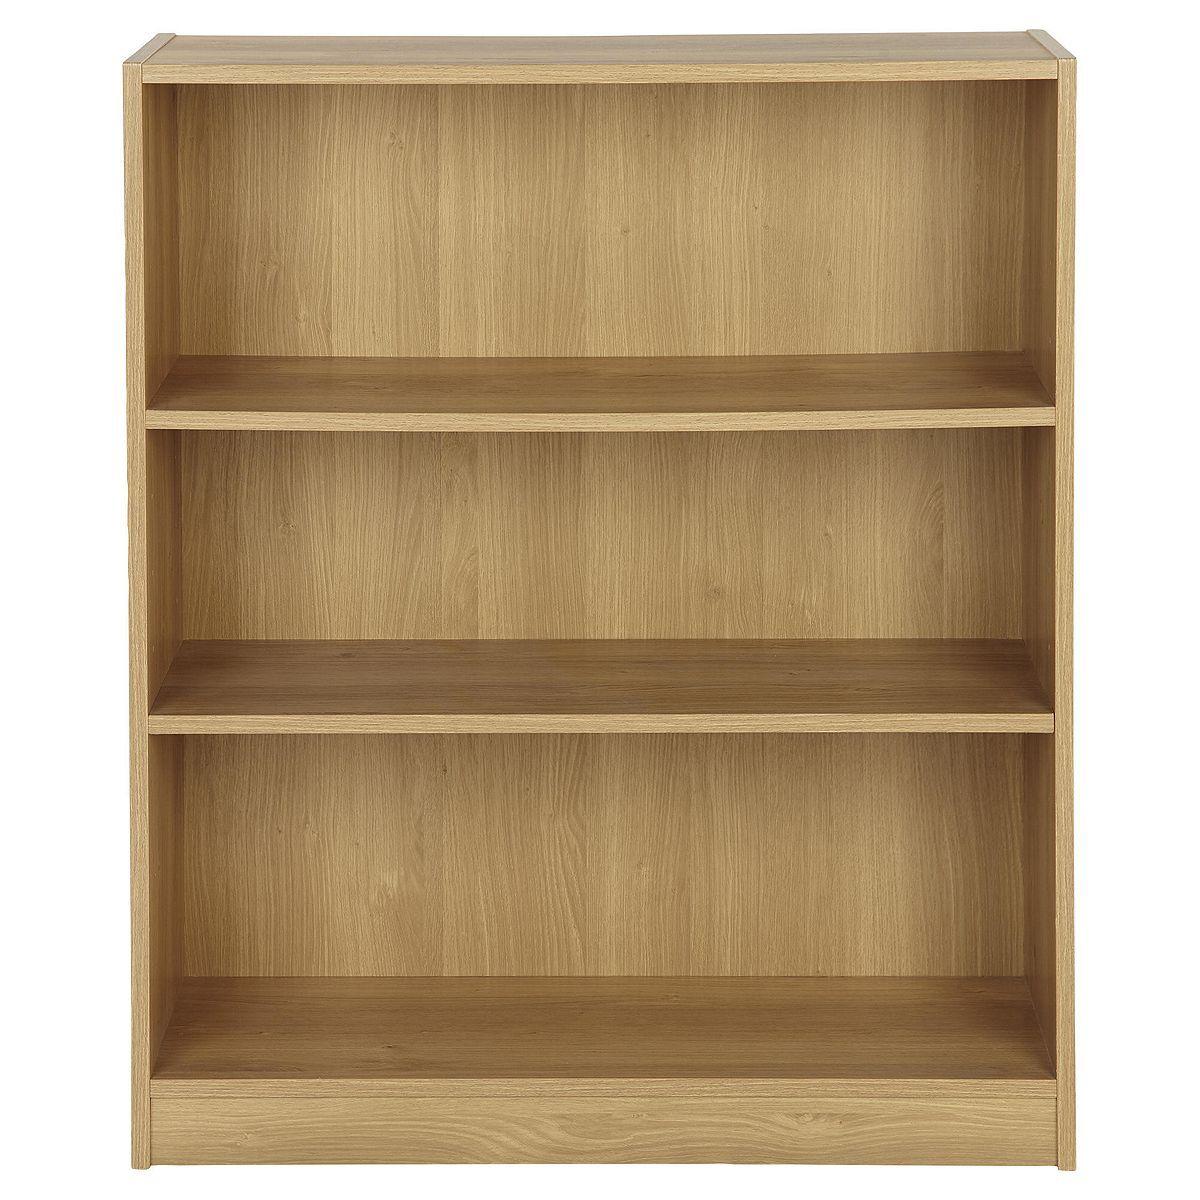 Tesco Direct Vernon Wide 3 Shelf Bookcase Oak Tesco Direct 3 Shelf Bookcase Bookcase